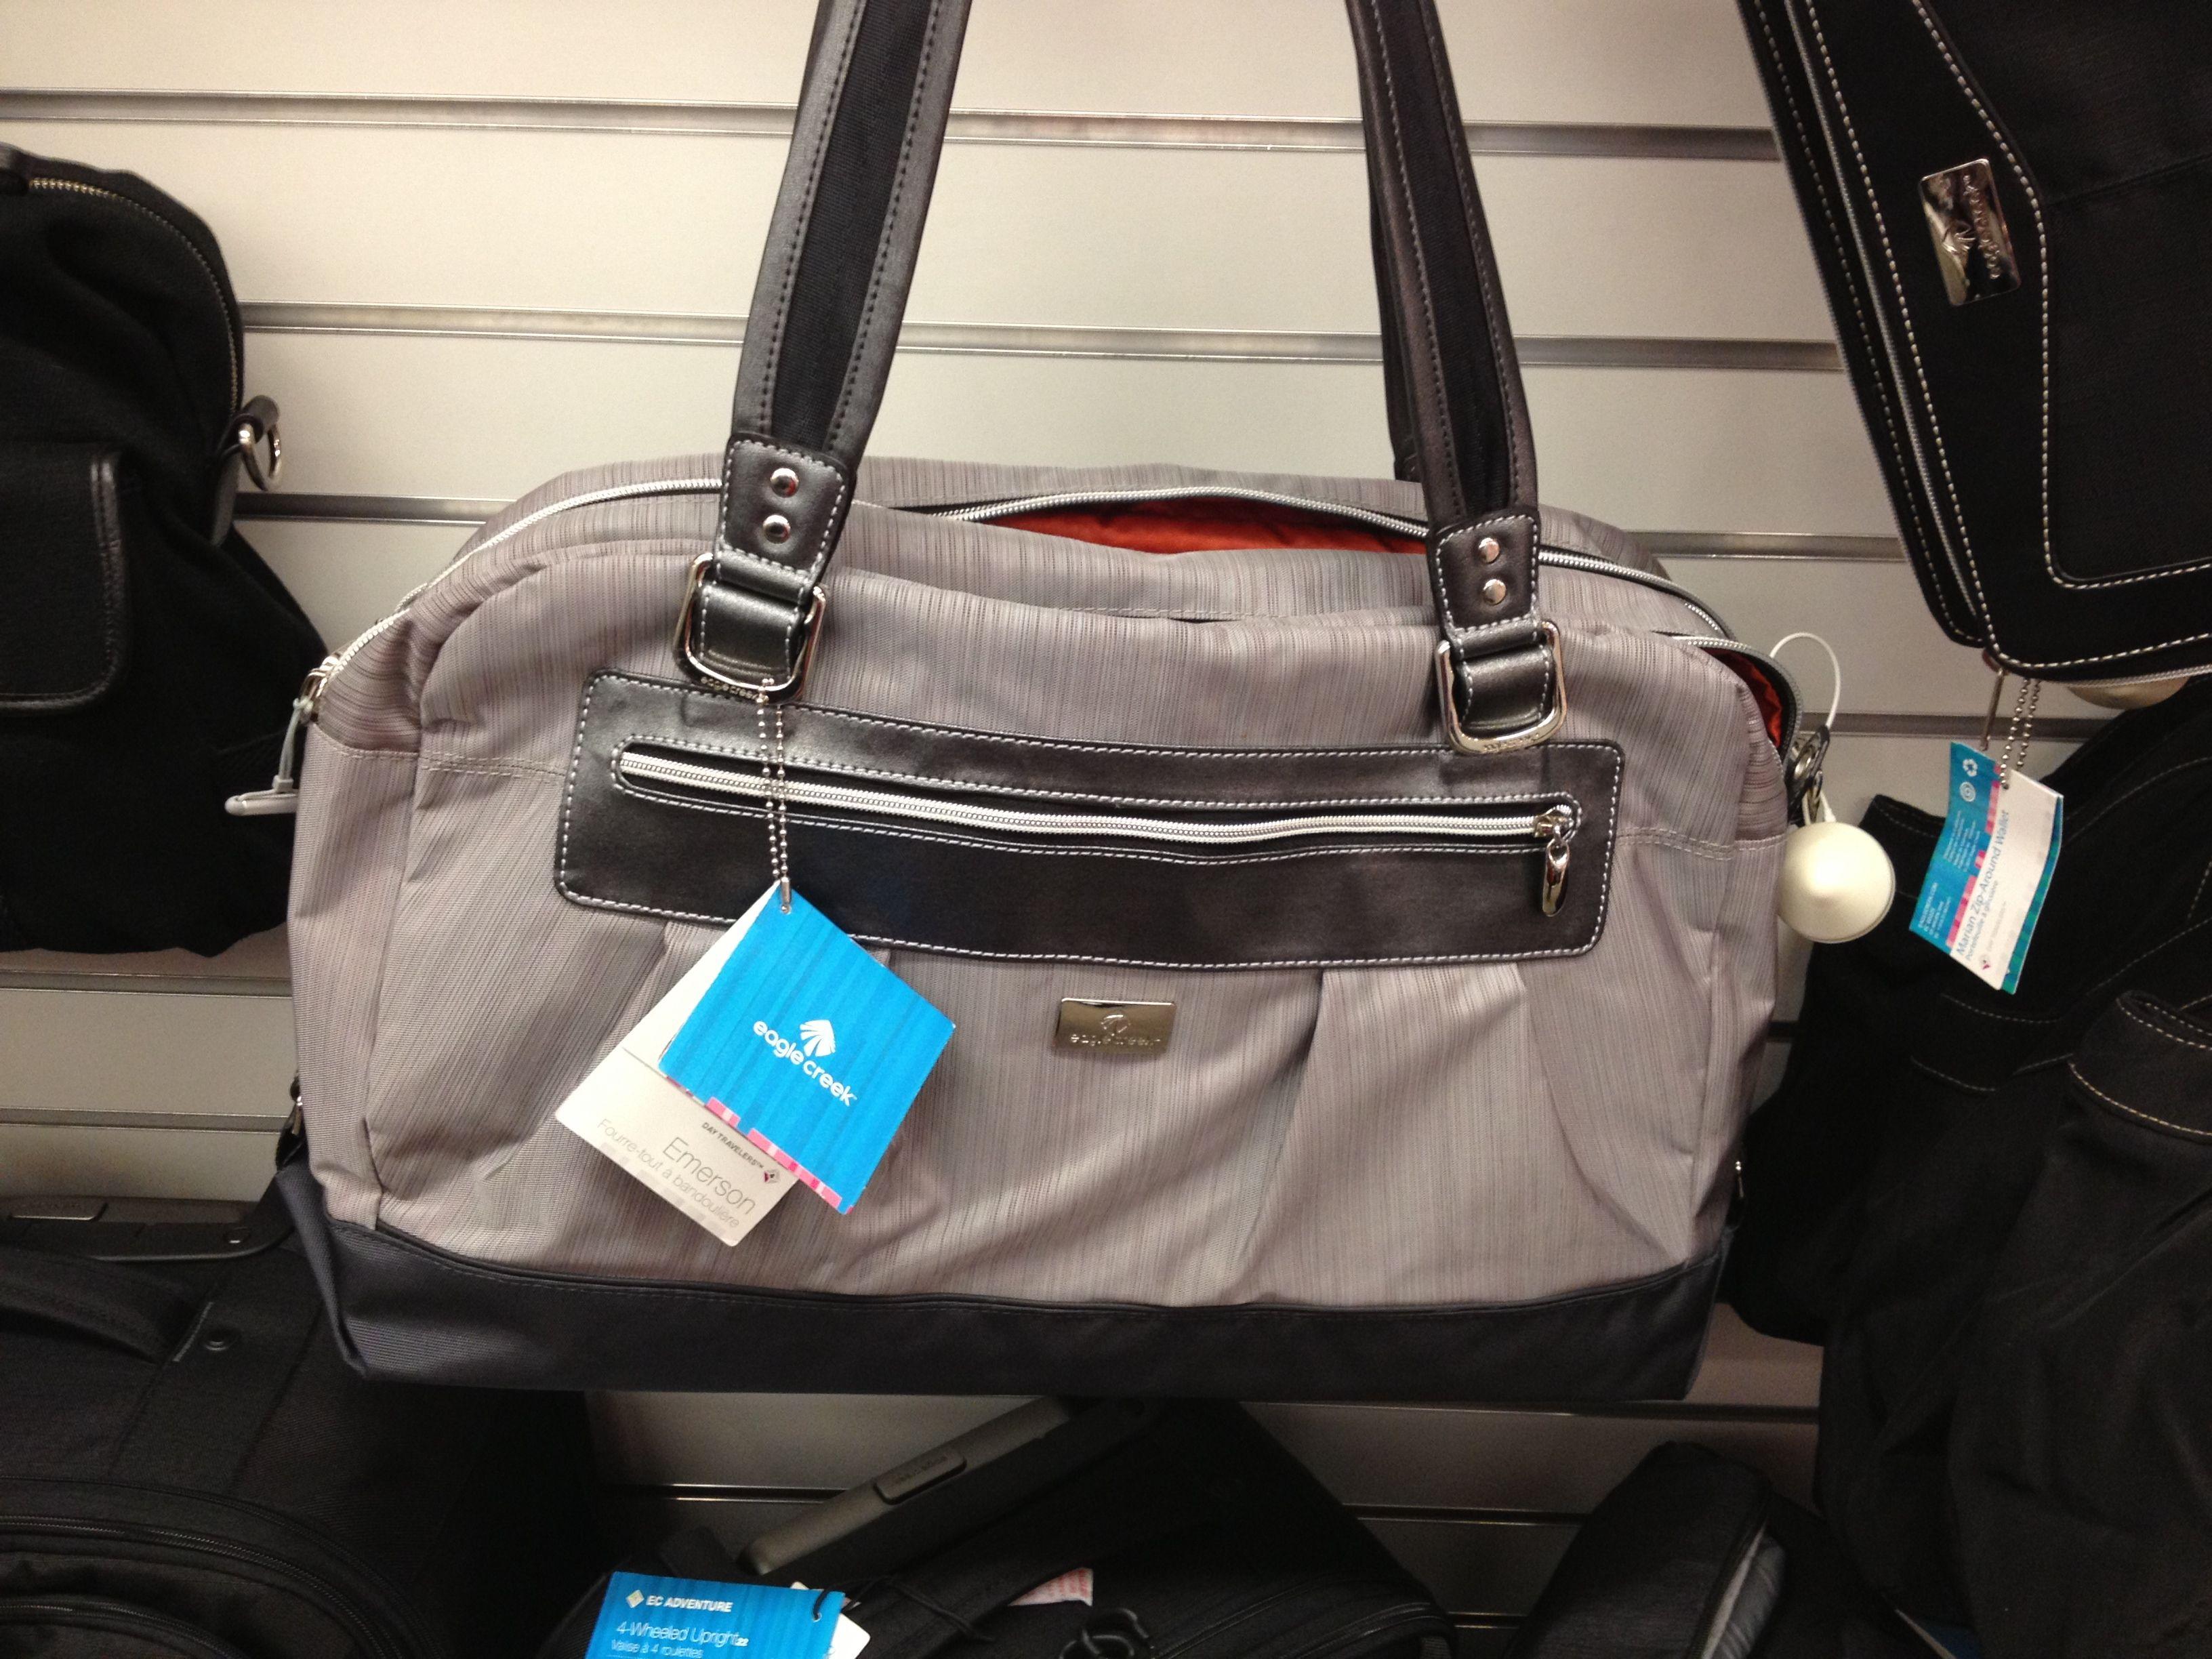 Eagle Creek Emerson Overnight Bag $159